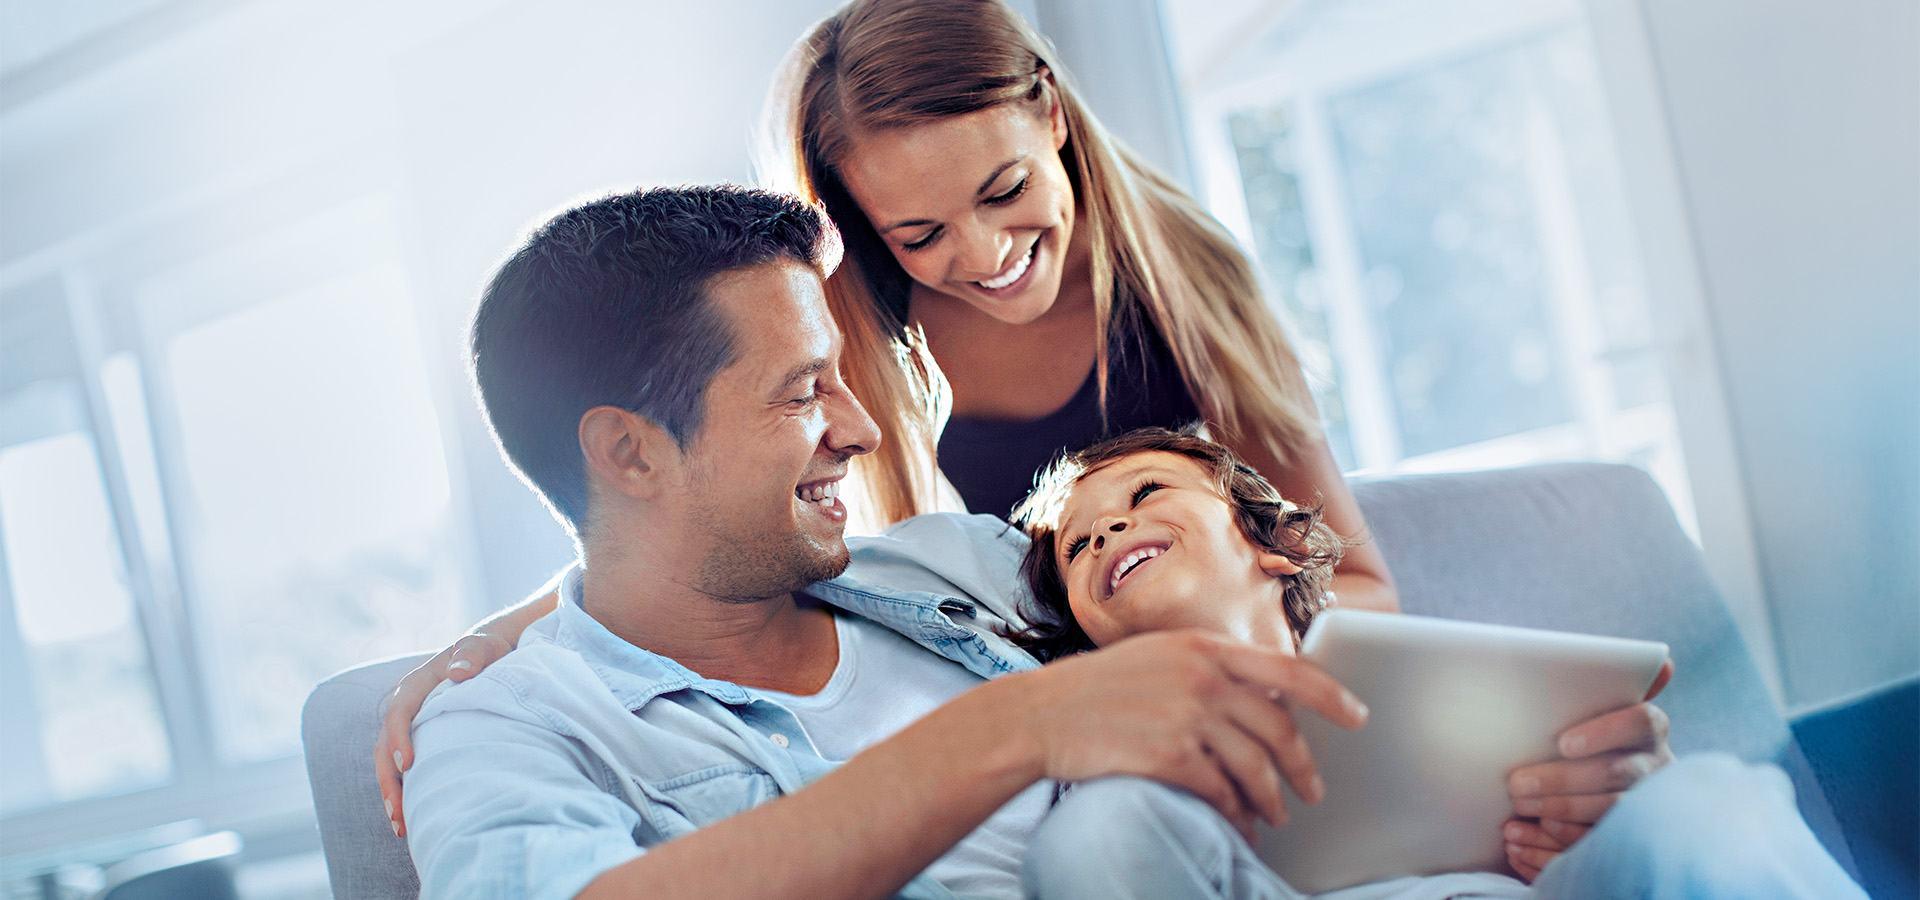 PRIMAGAS - Homepage - Familie, glücklich, Ipad